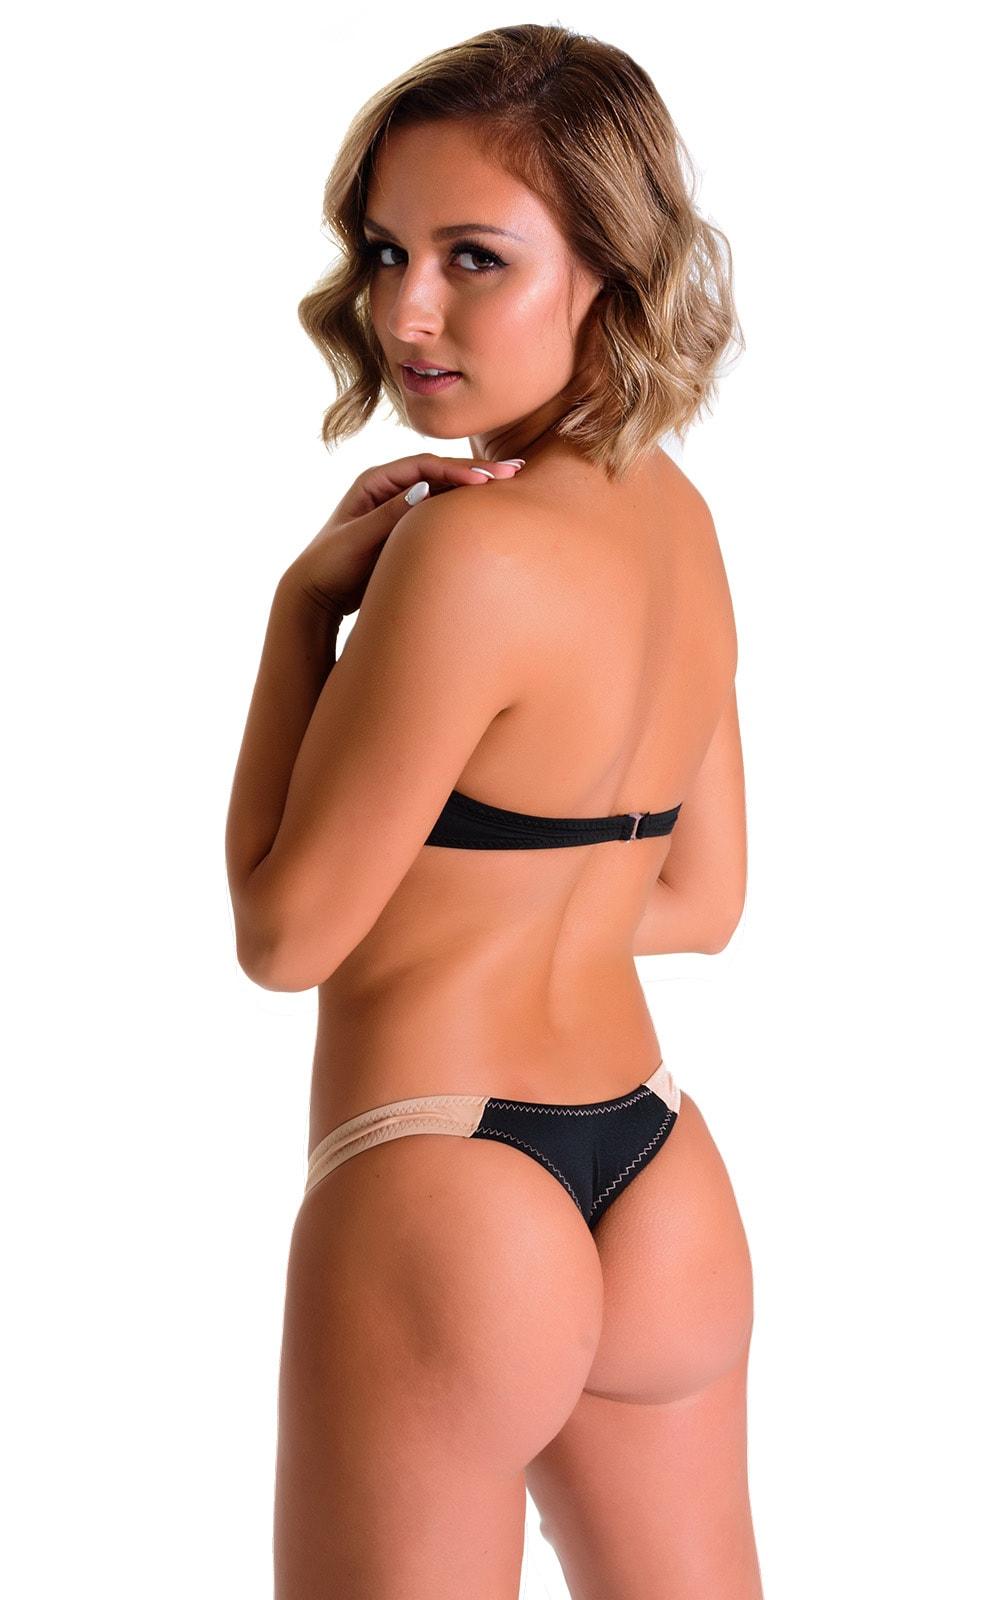 Twistie Bandeau Swim Top in Super ThinSKINZ Black 2